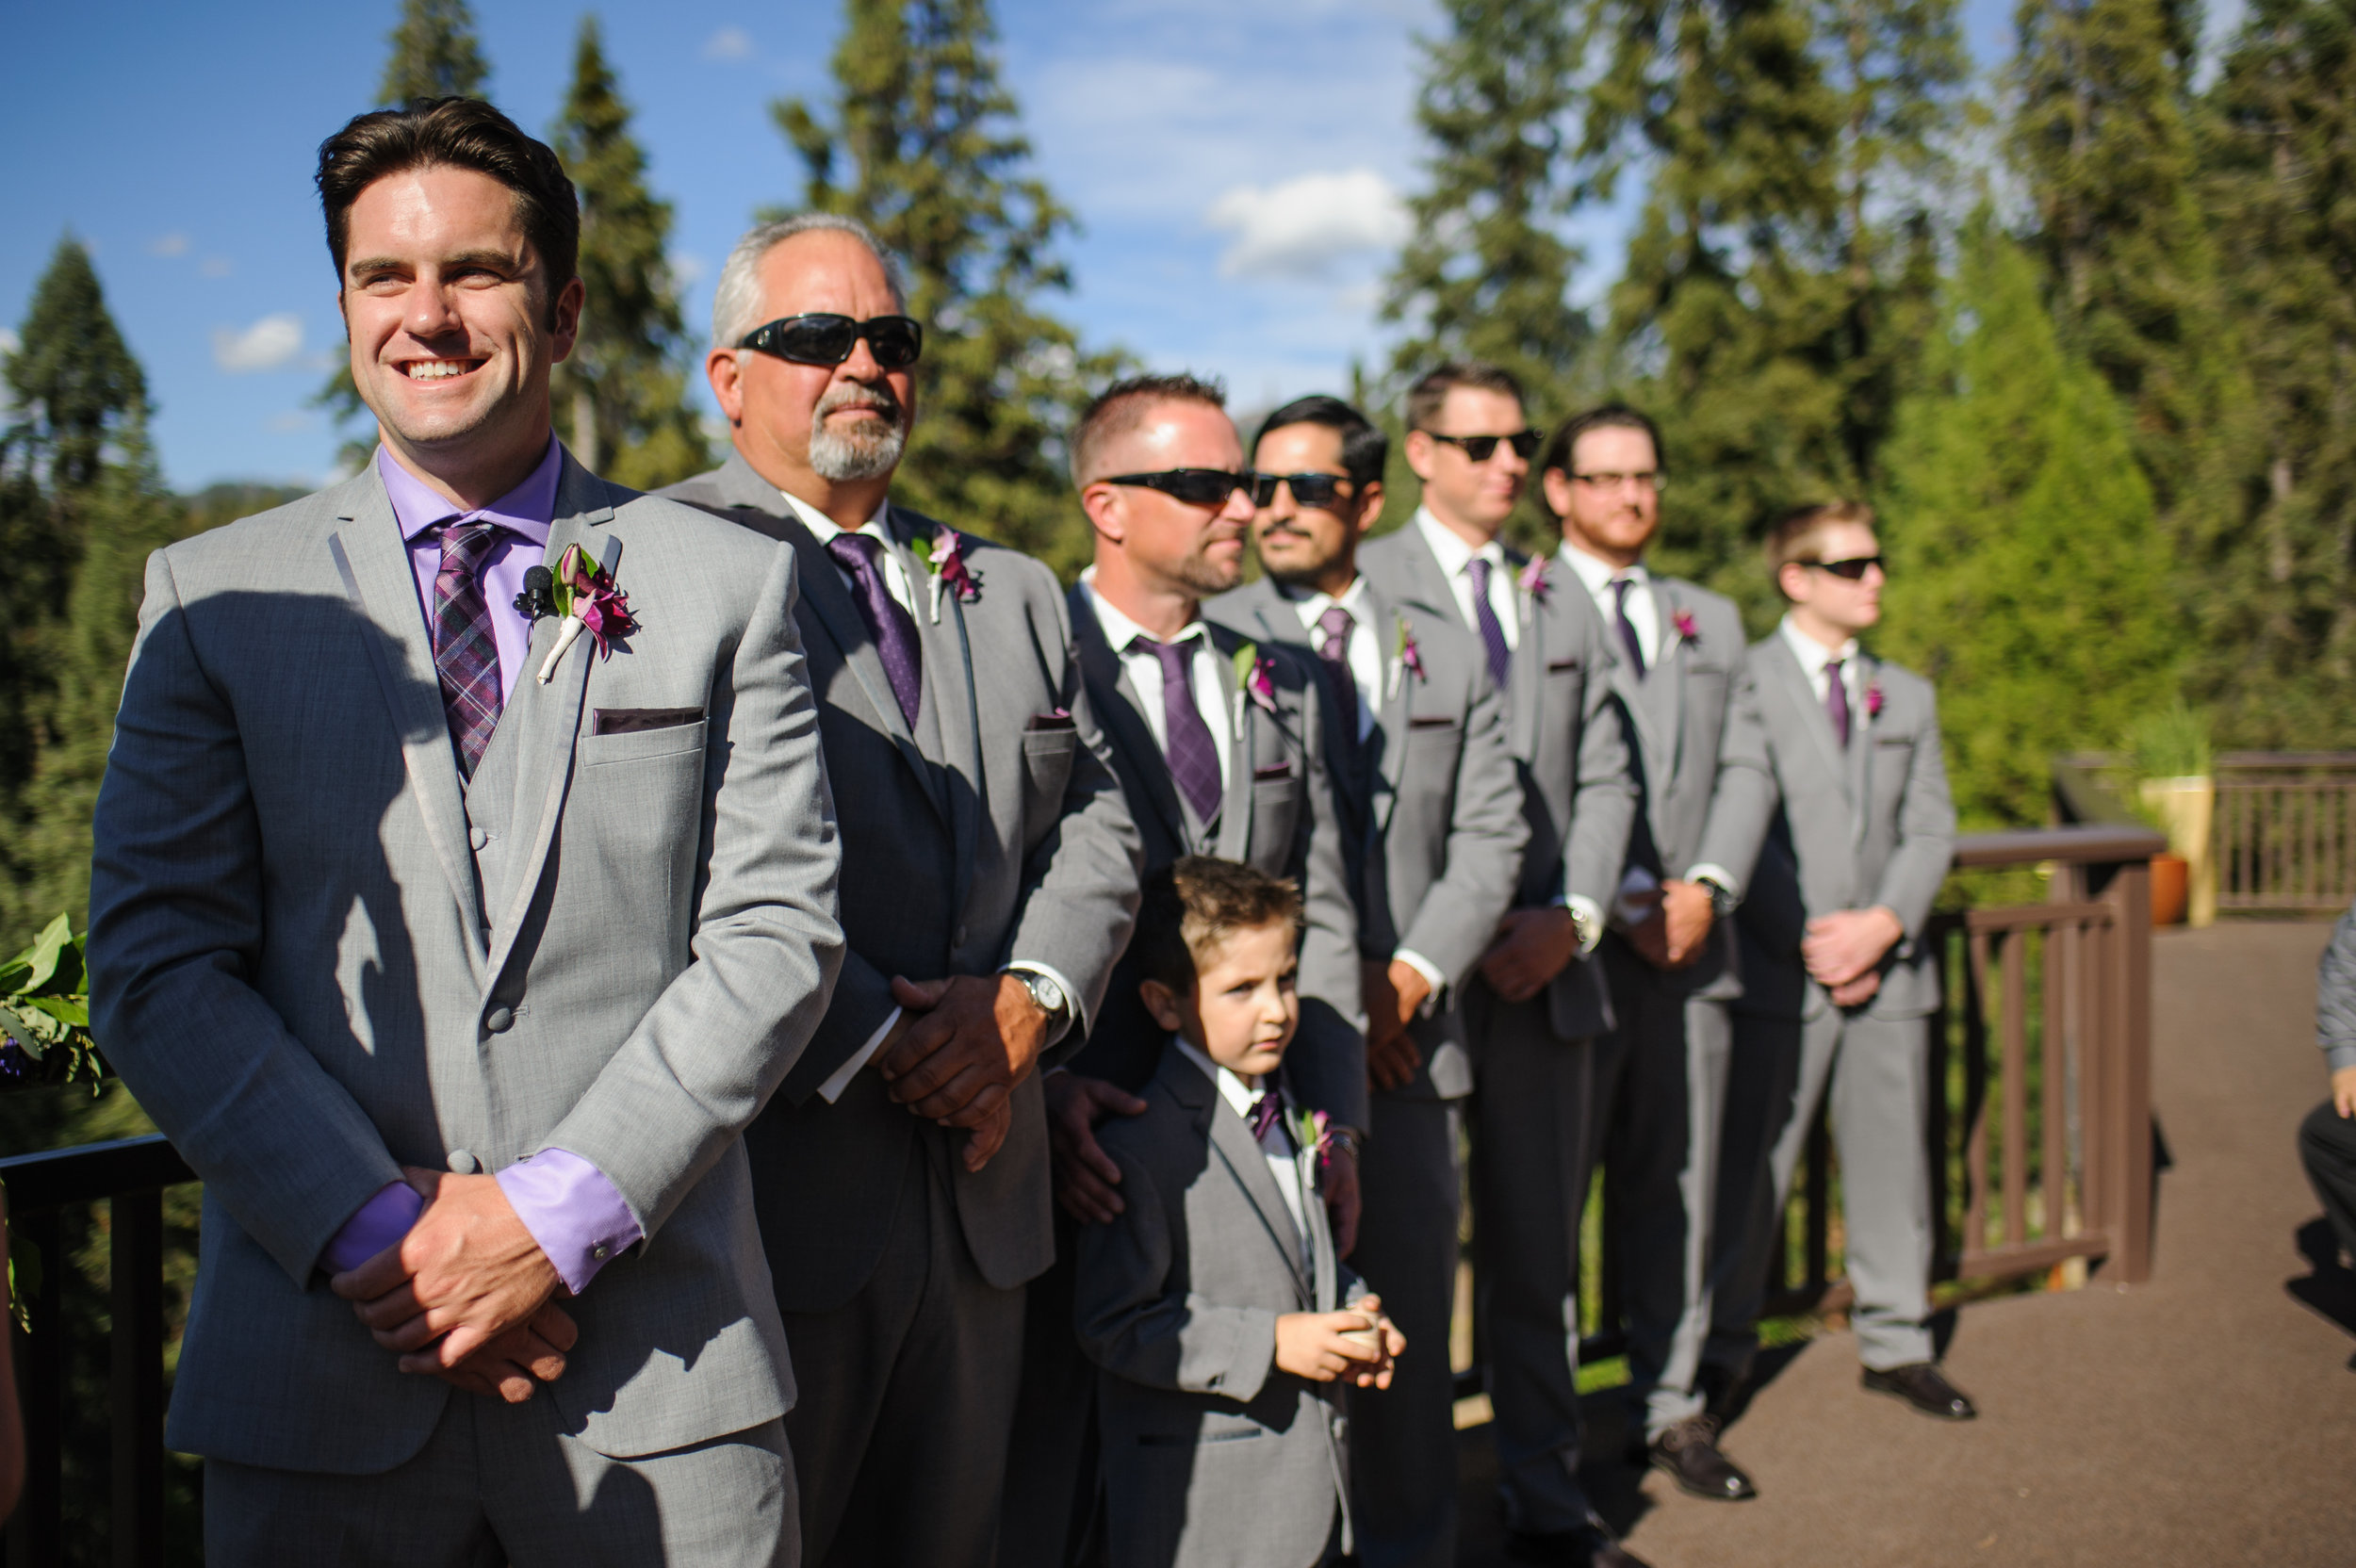 becca-jacob-011-tenaya-lodge-yosemite-wedding-photographer-katherine-nicole-photography.JPG